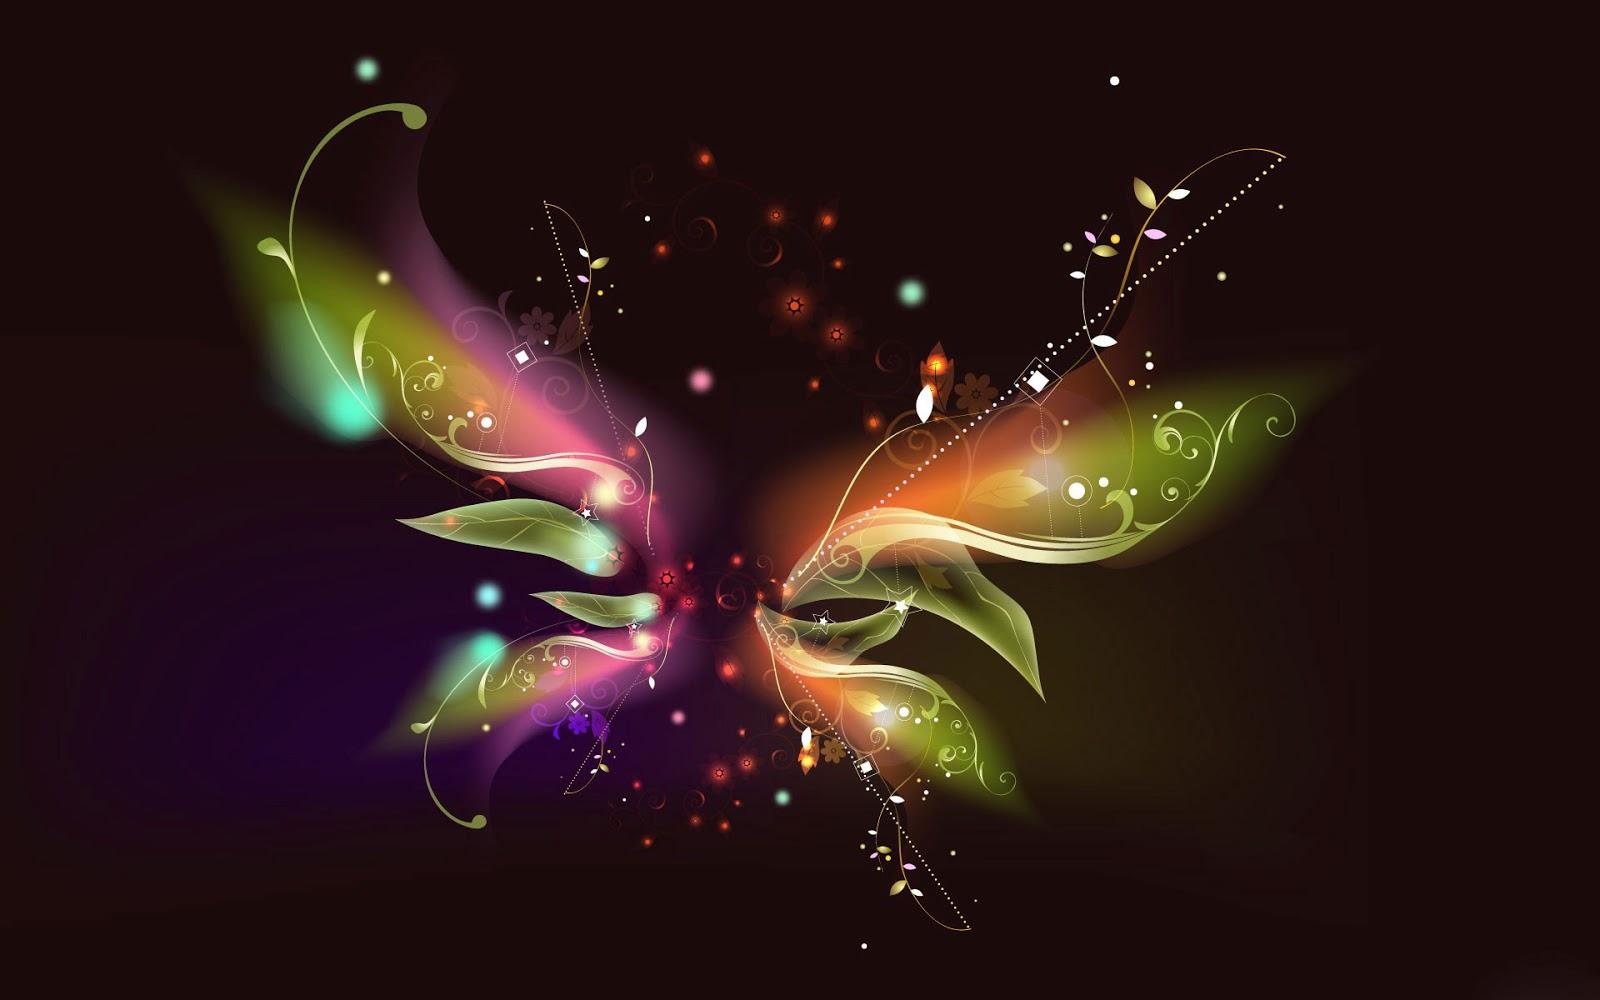 Butterfly wallpaper butterfly background wallpapers butterflies 1600x1000